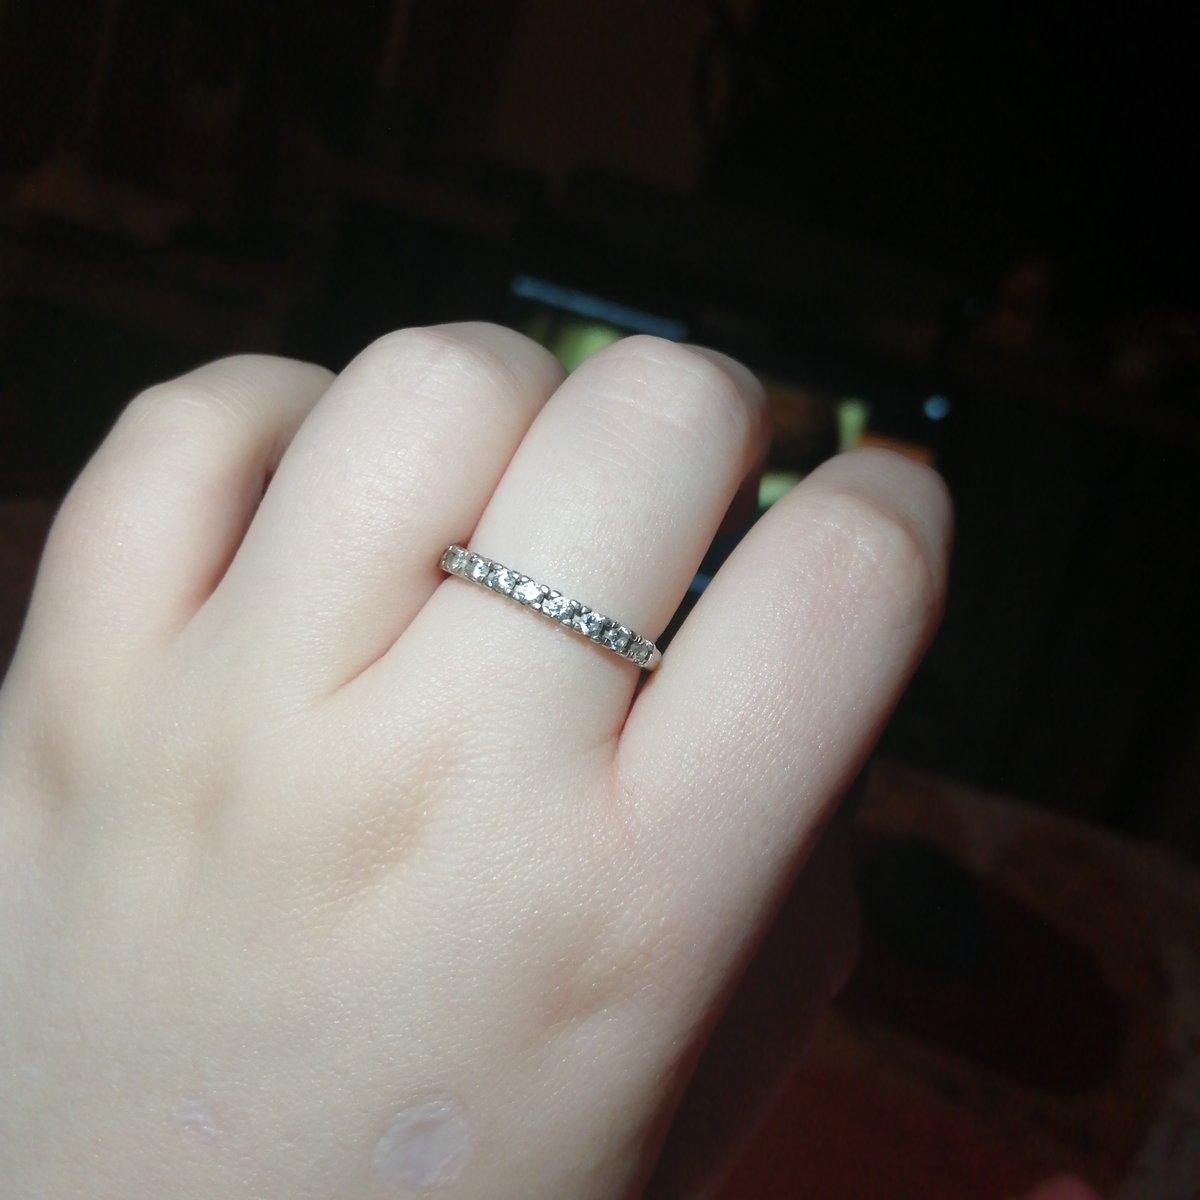 Брала кольцо себе